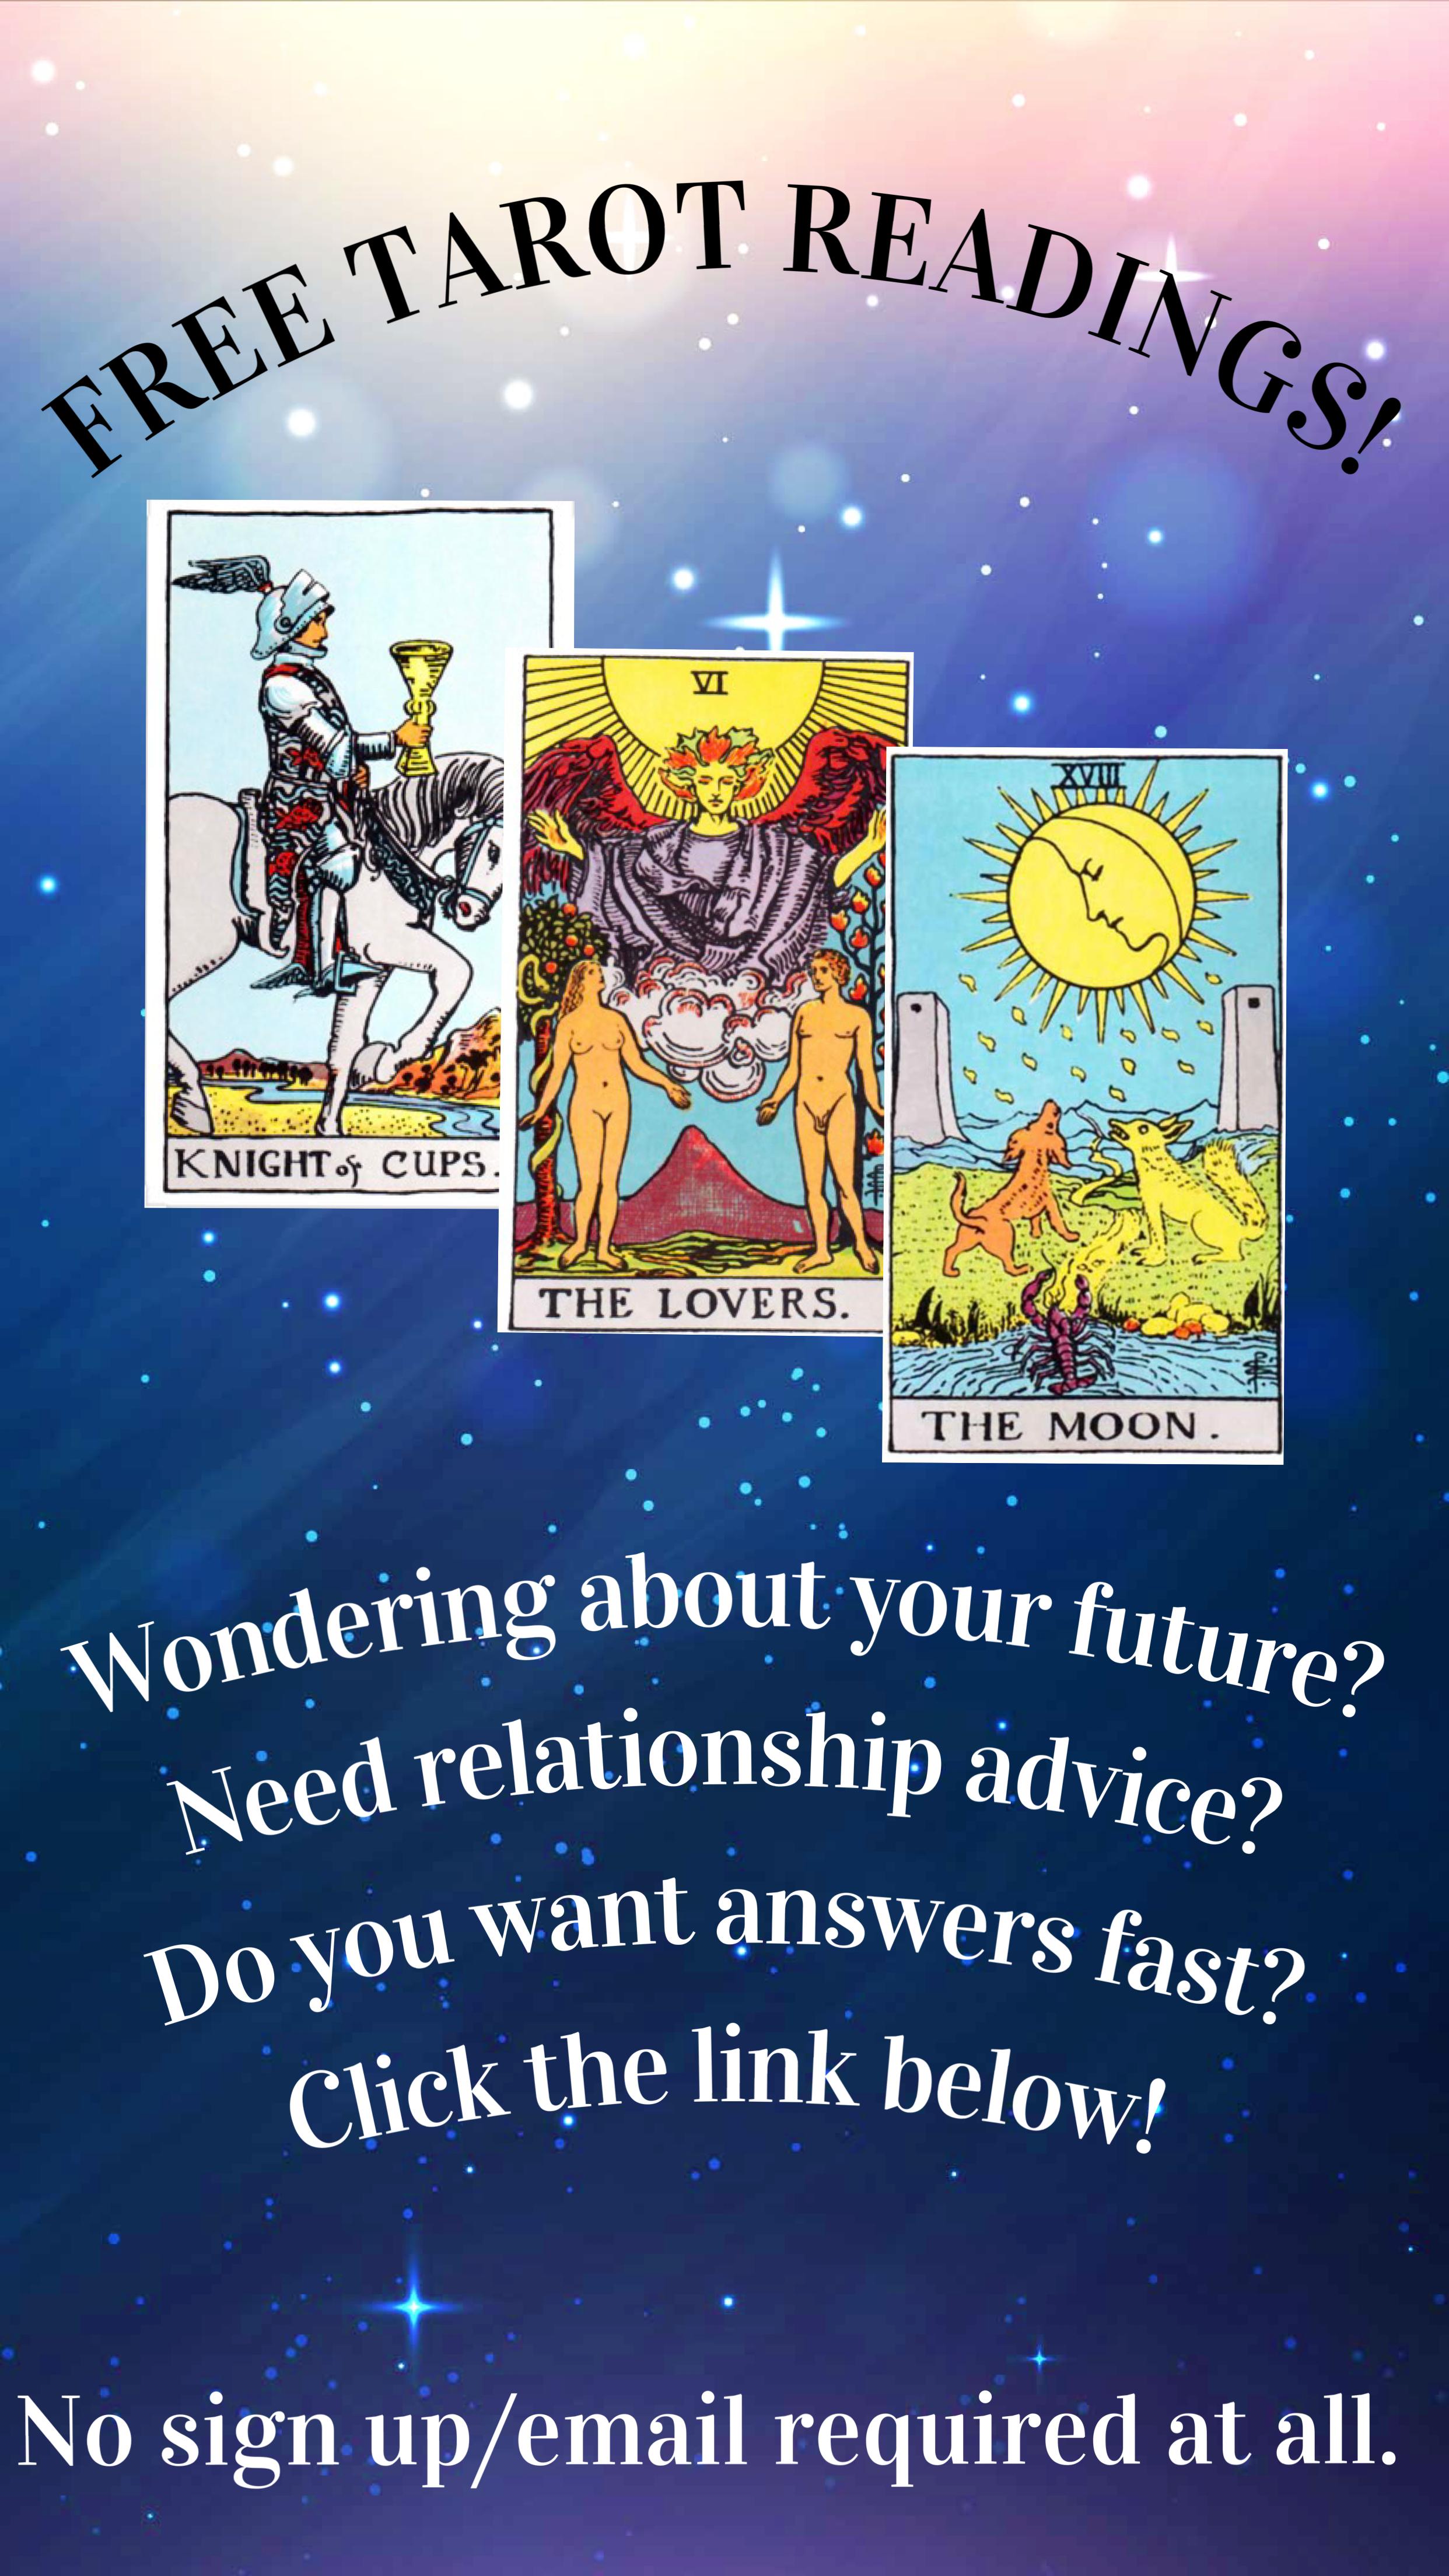 Free Tarot Readings  Free tarot reading, Reading tarot cards